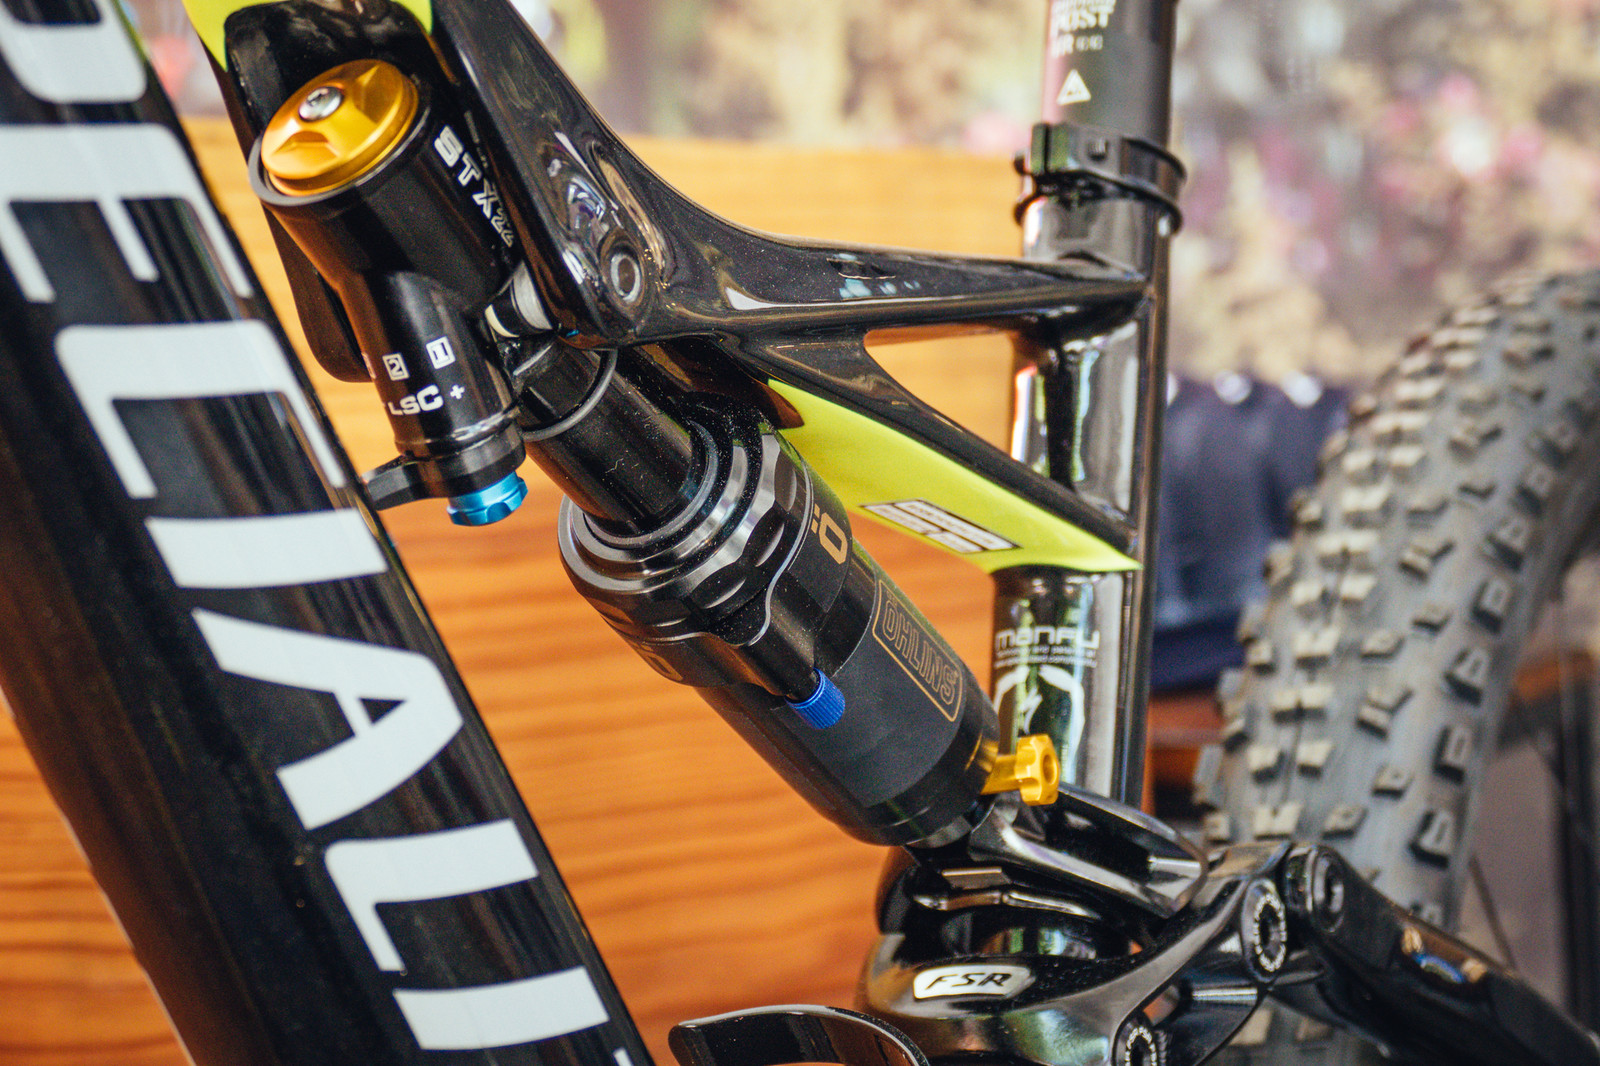 Custom Inline Öhlins STX 22 Shock - PIT BITS - New 2017 Products from Crankworx Whistler - Mountain Biking Pictures - Vital MTB